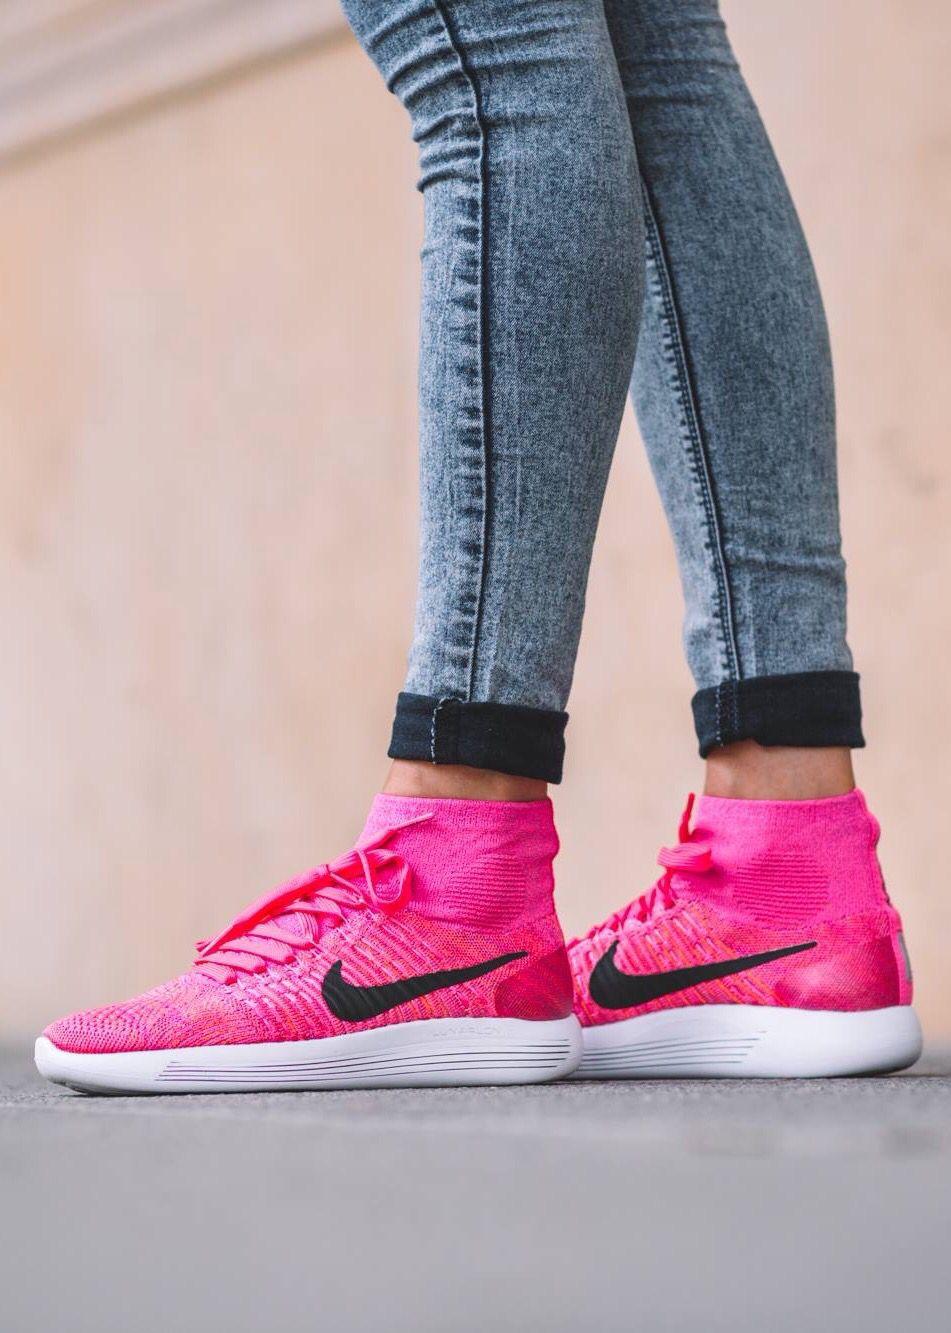 Nike Lunar Epic Flyknit: Pink